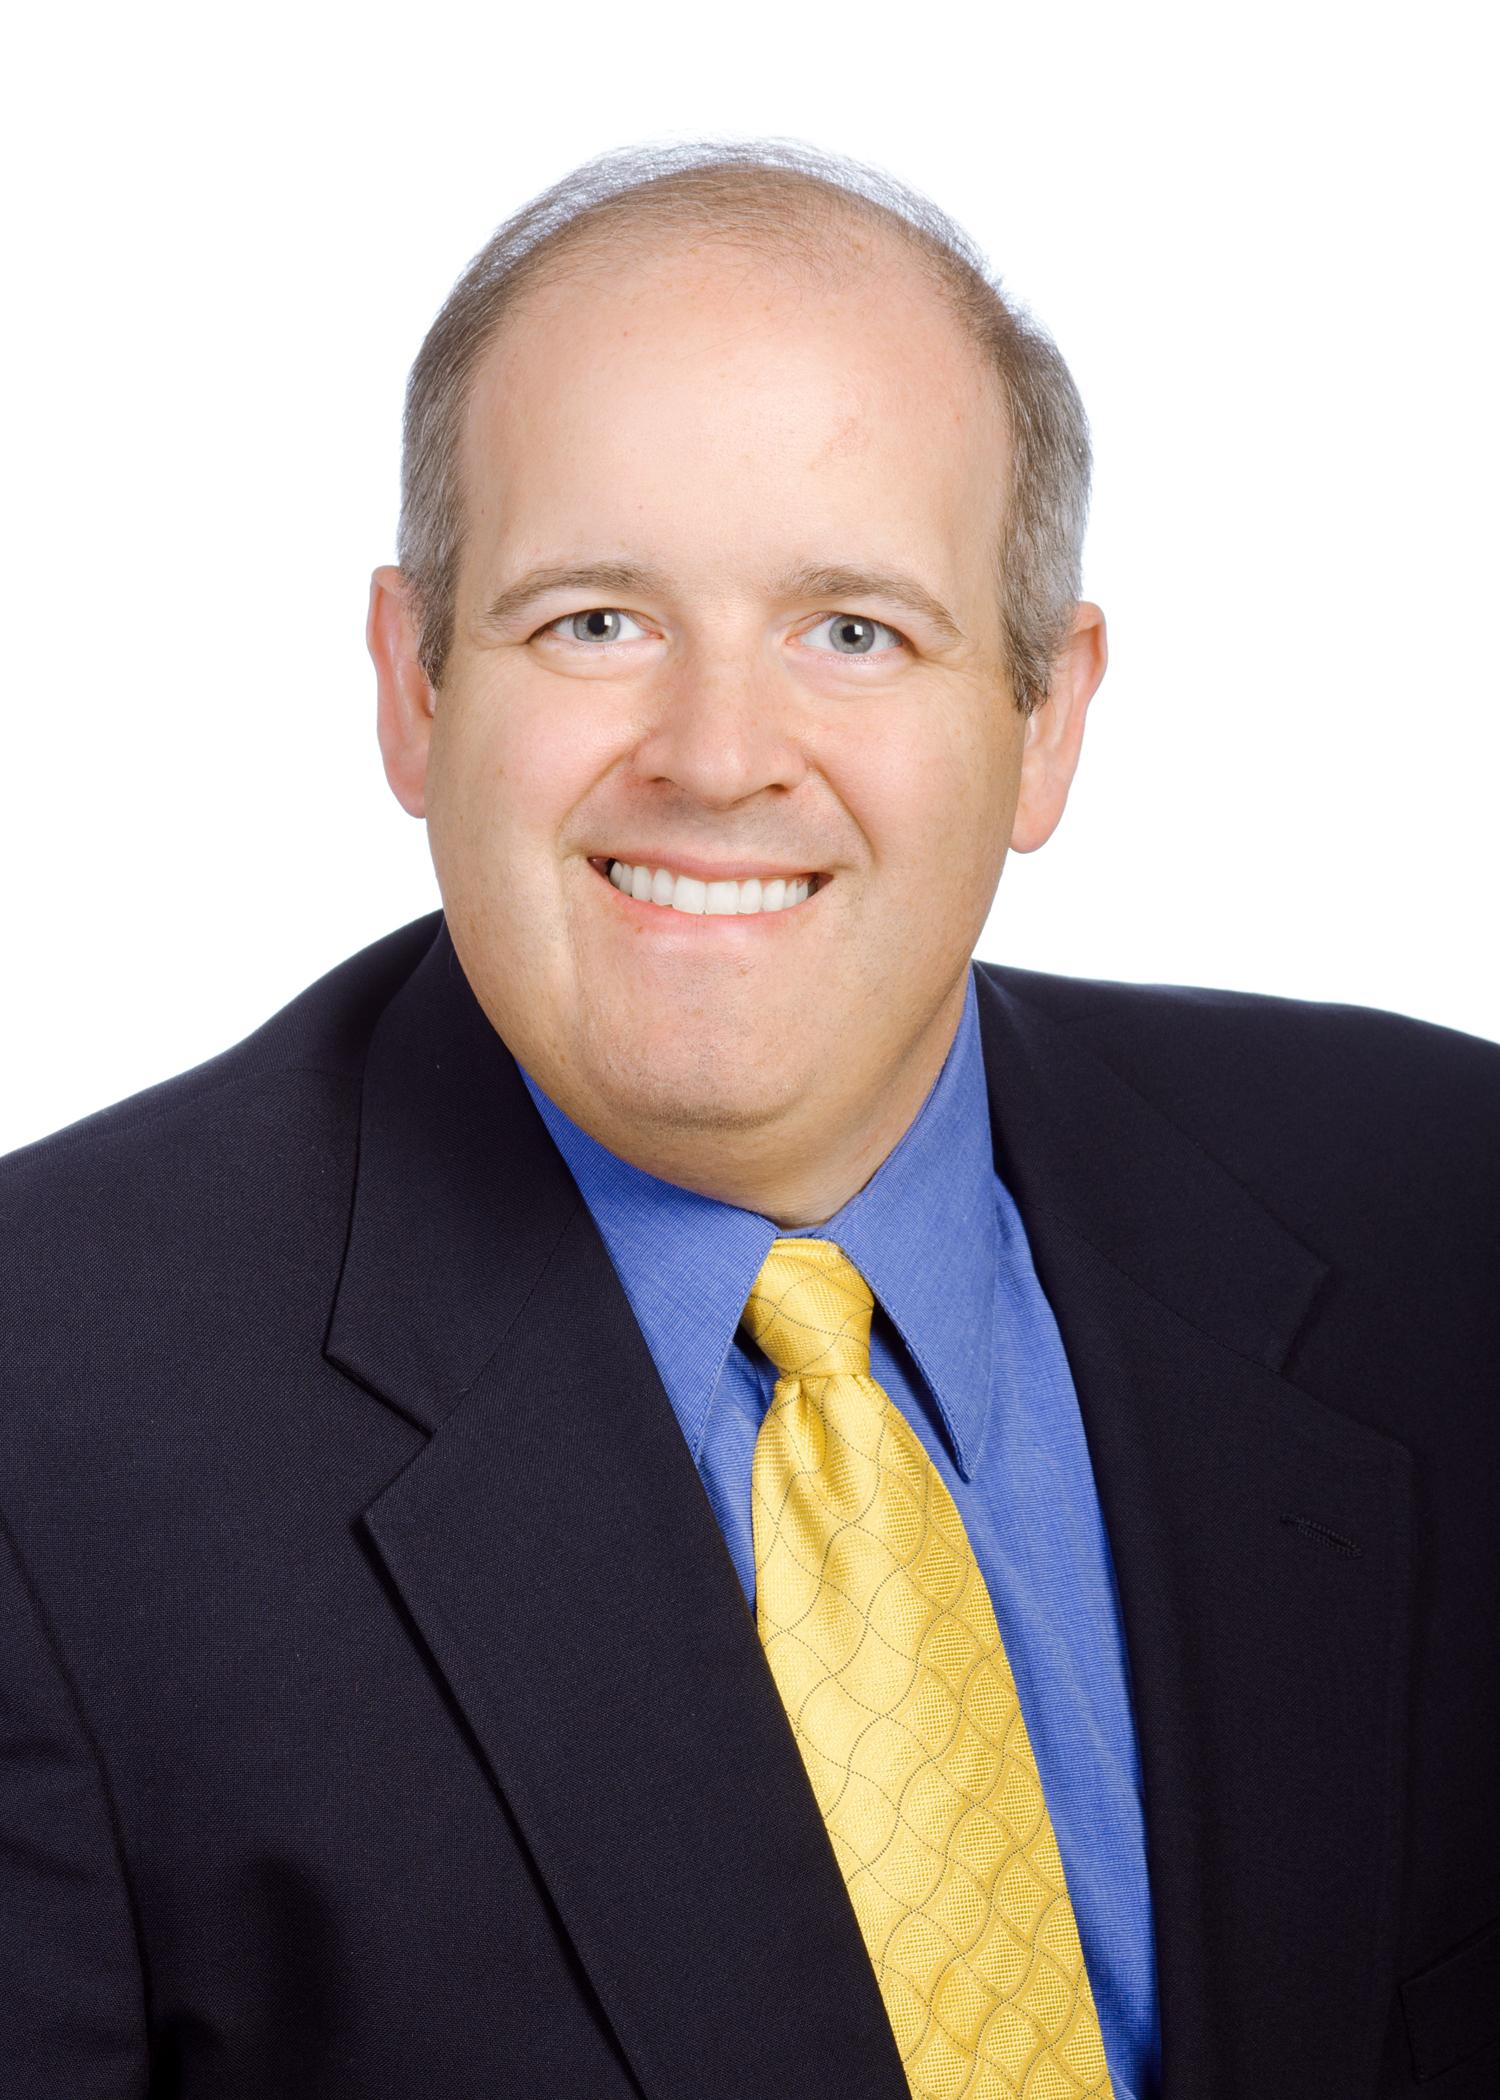 Matt McDonald CPA - Construction Accounting